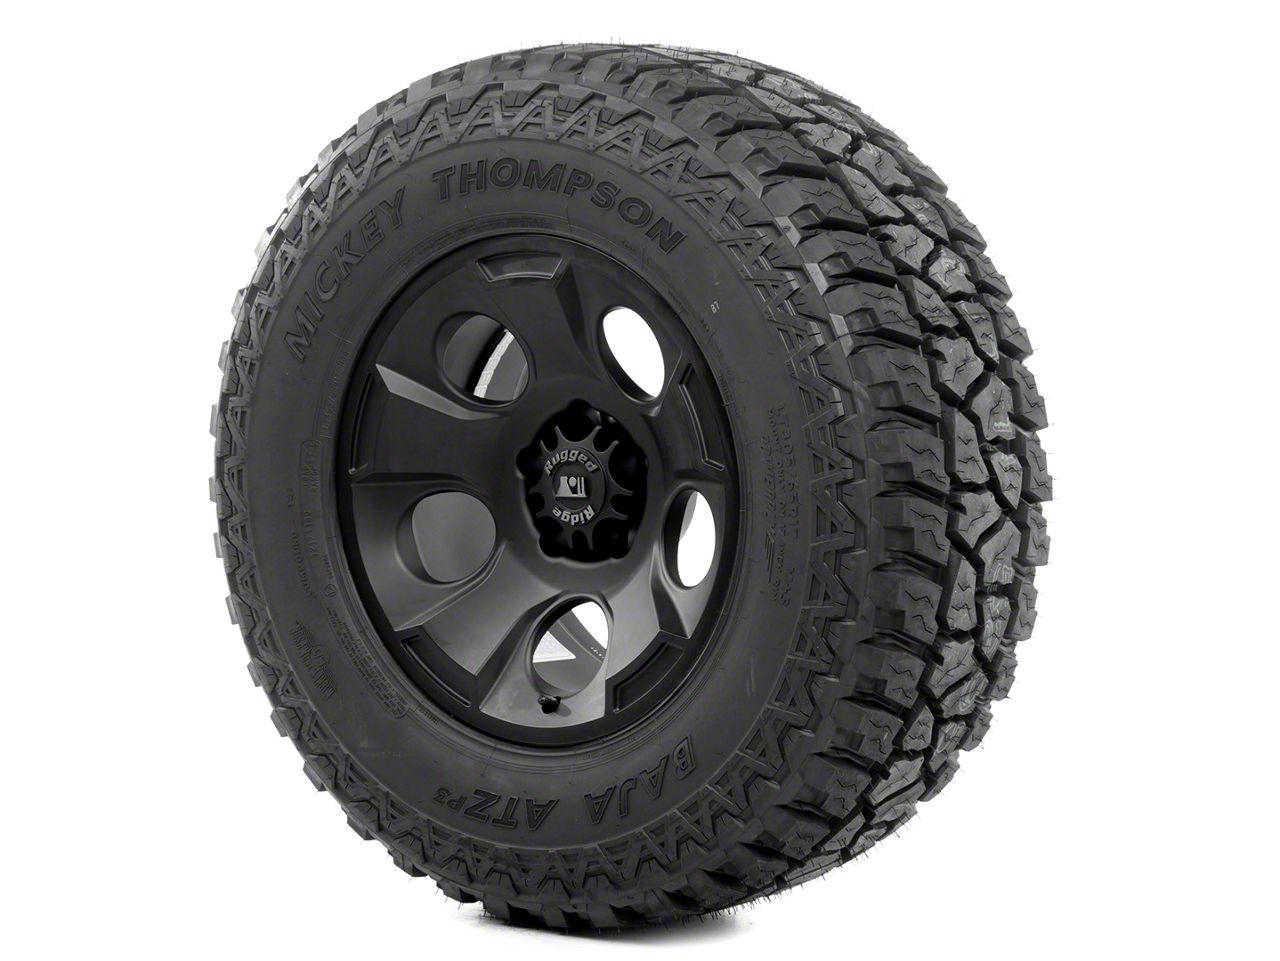 Rugged Ridge Drakon Wheel 17x9 Black Satin and Mickey Thompson ATZ 305/65R17 Tire Kit (07-18 Jeep Wrangler JK)